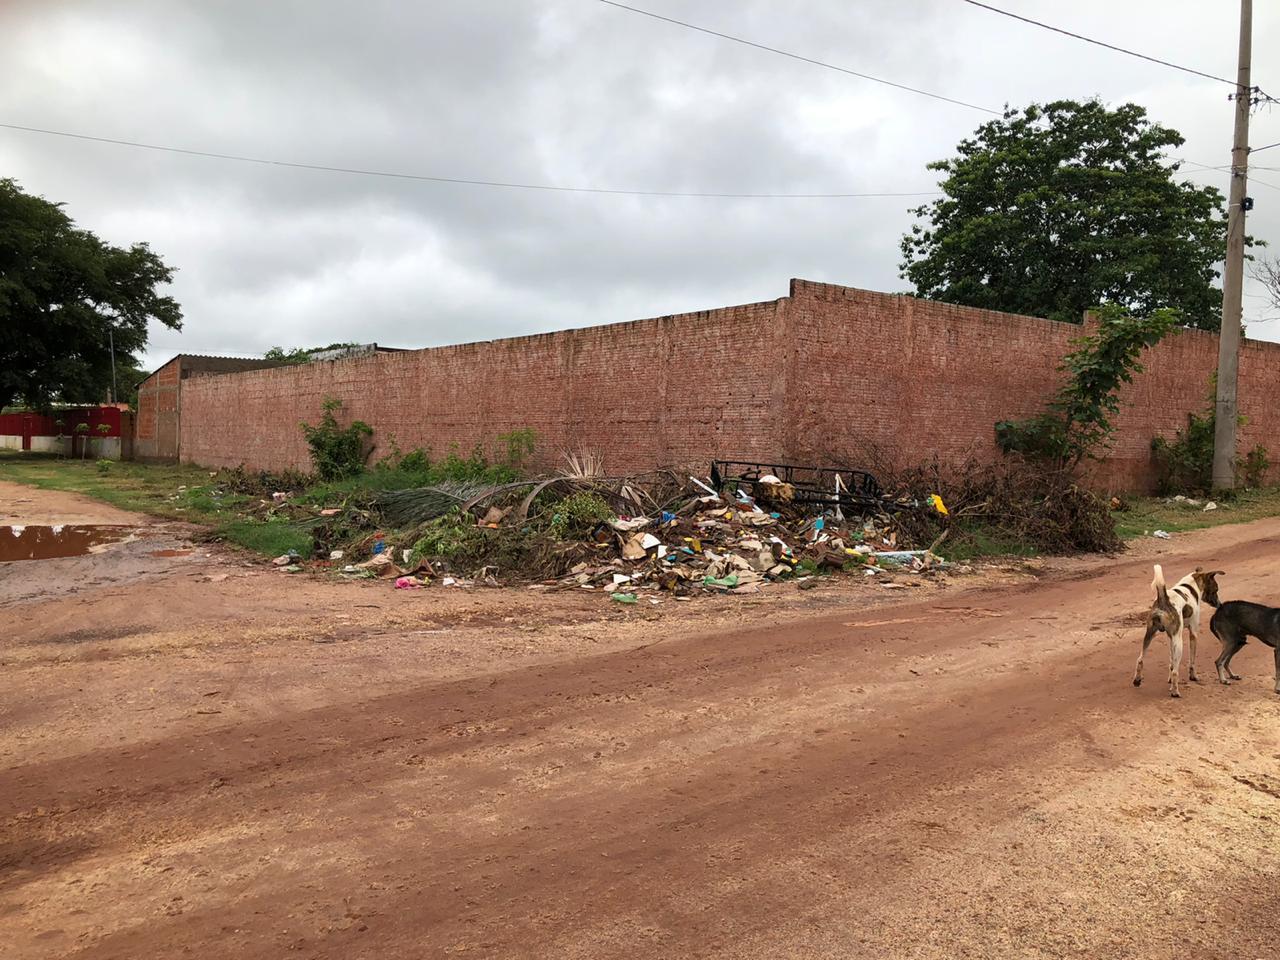 Lixo também toma conta das ruas, principalmente nos bairros